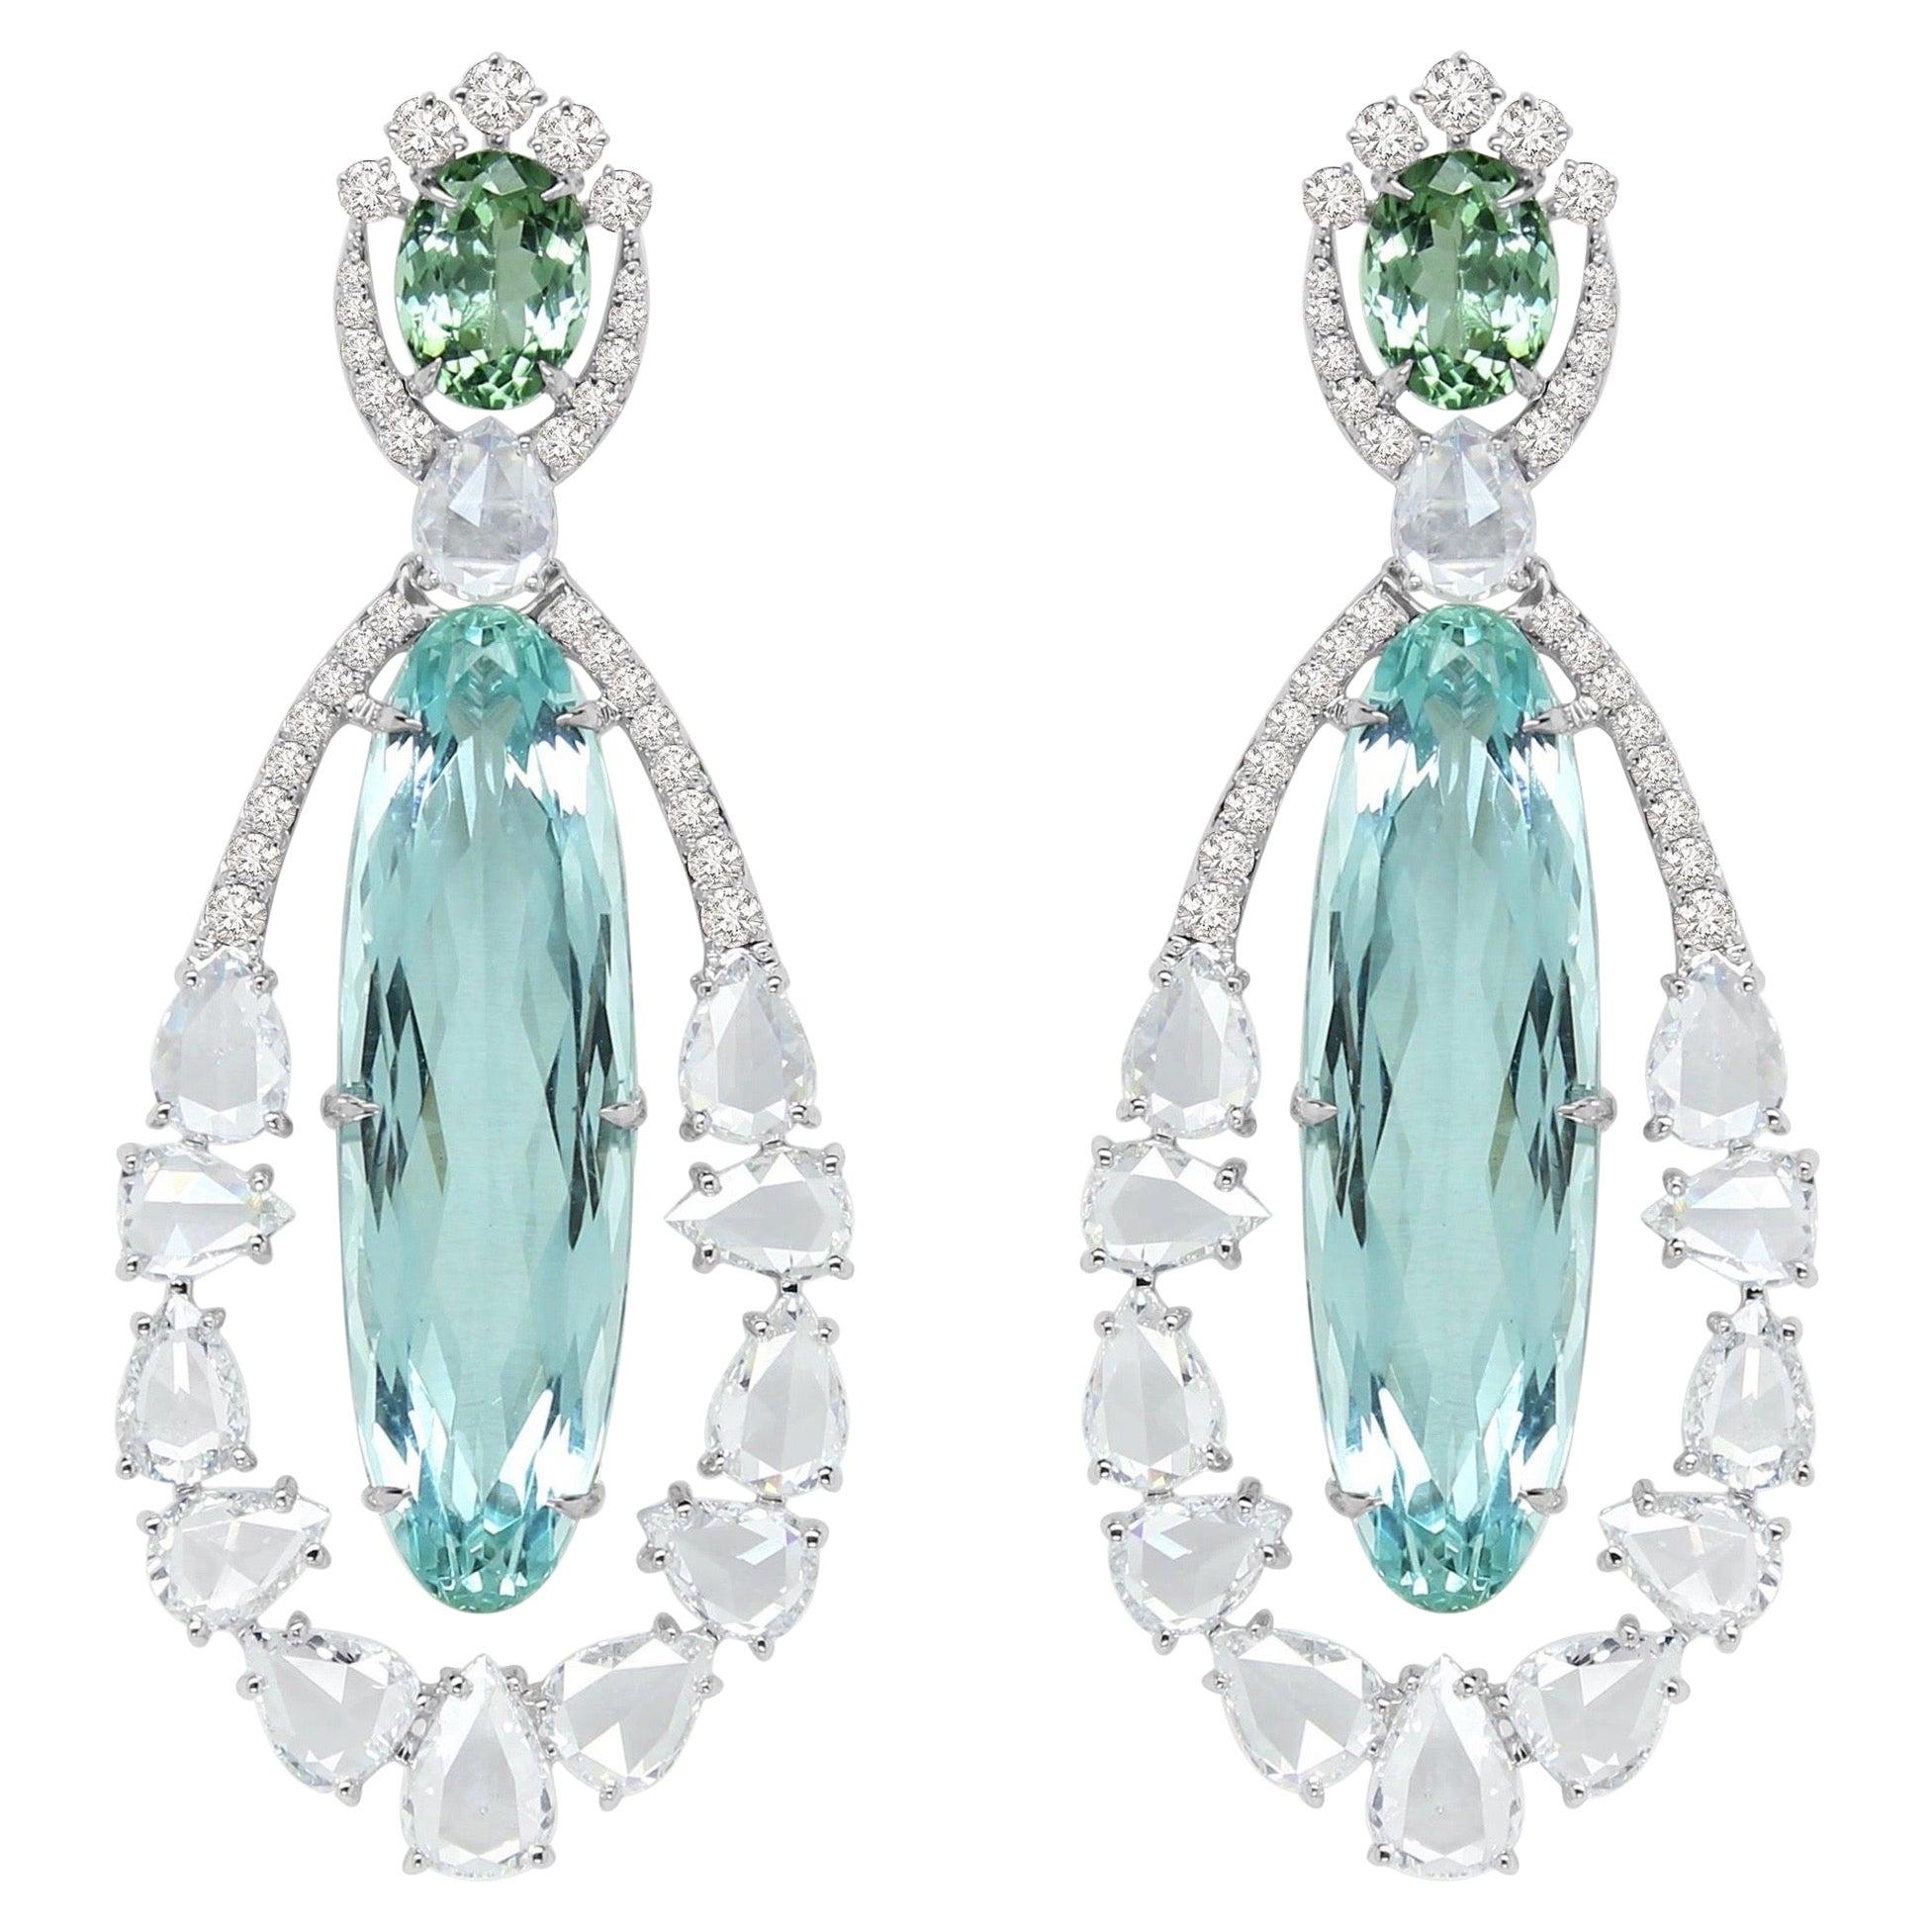 22.75 Carat Paraiba Tourmaline Diamond 18 Karat White Gold Earrings